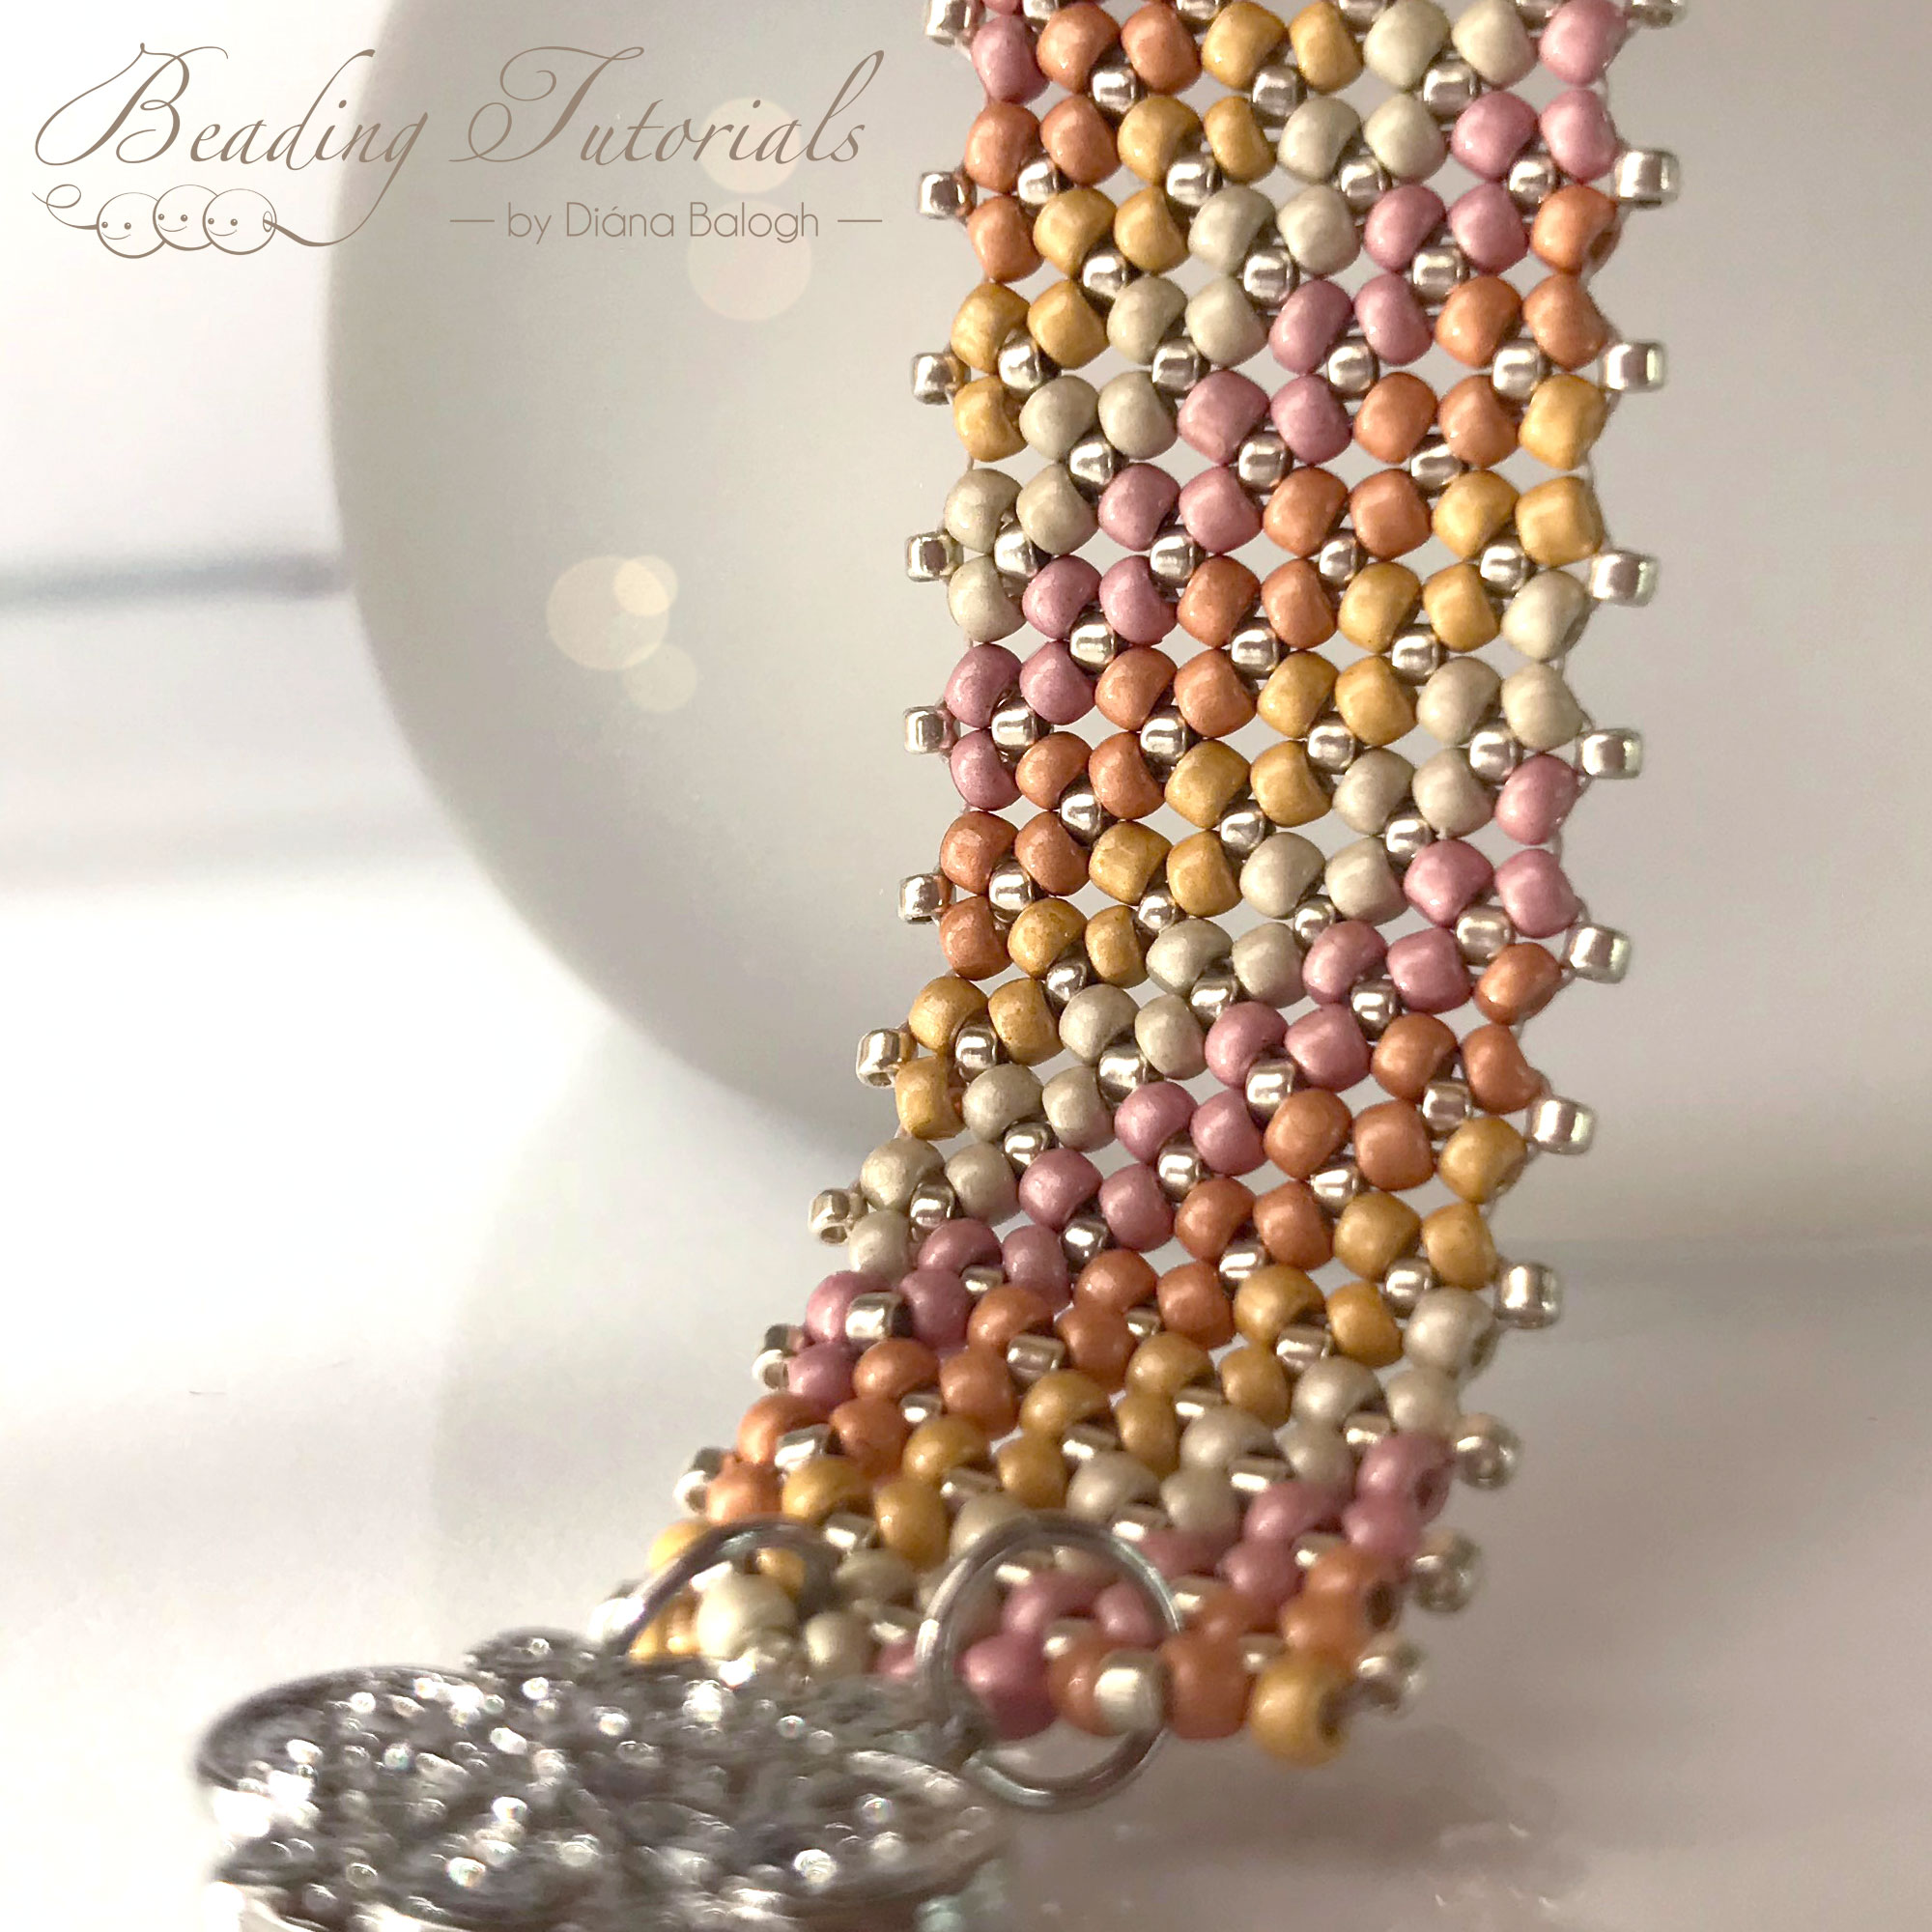 Nadia bracelet beading tutorial by Diána Balogh